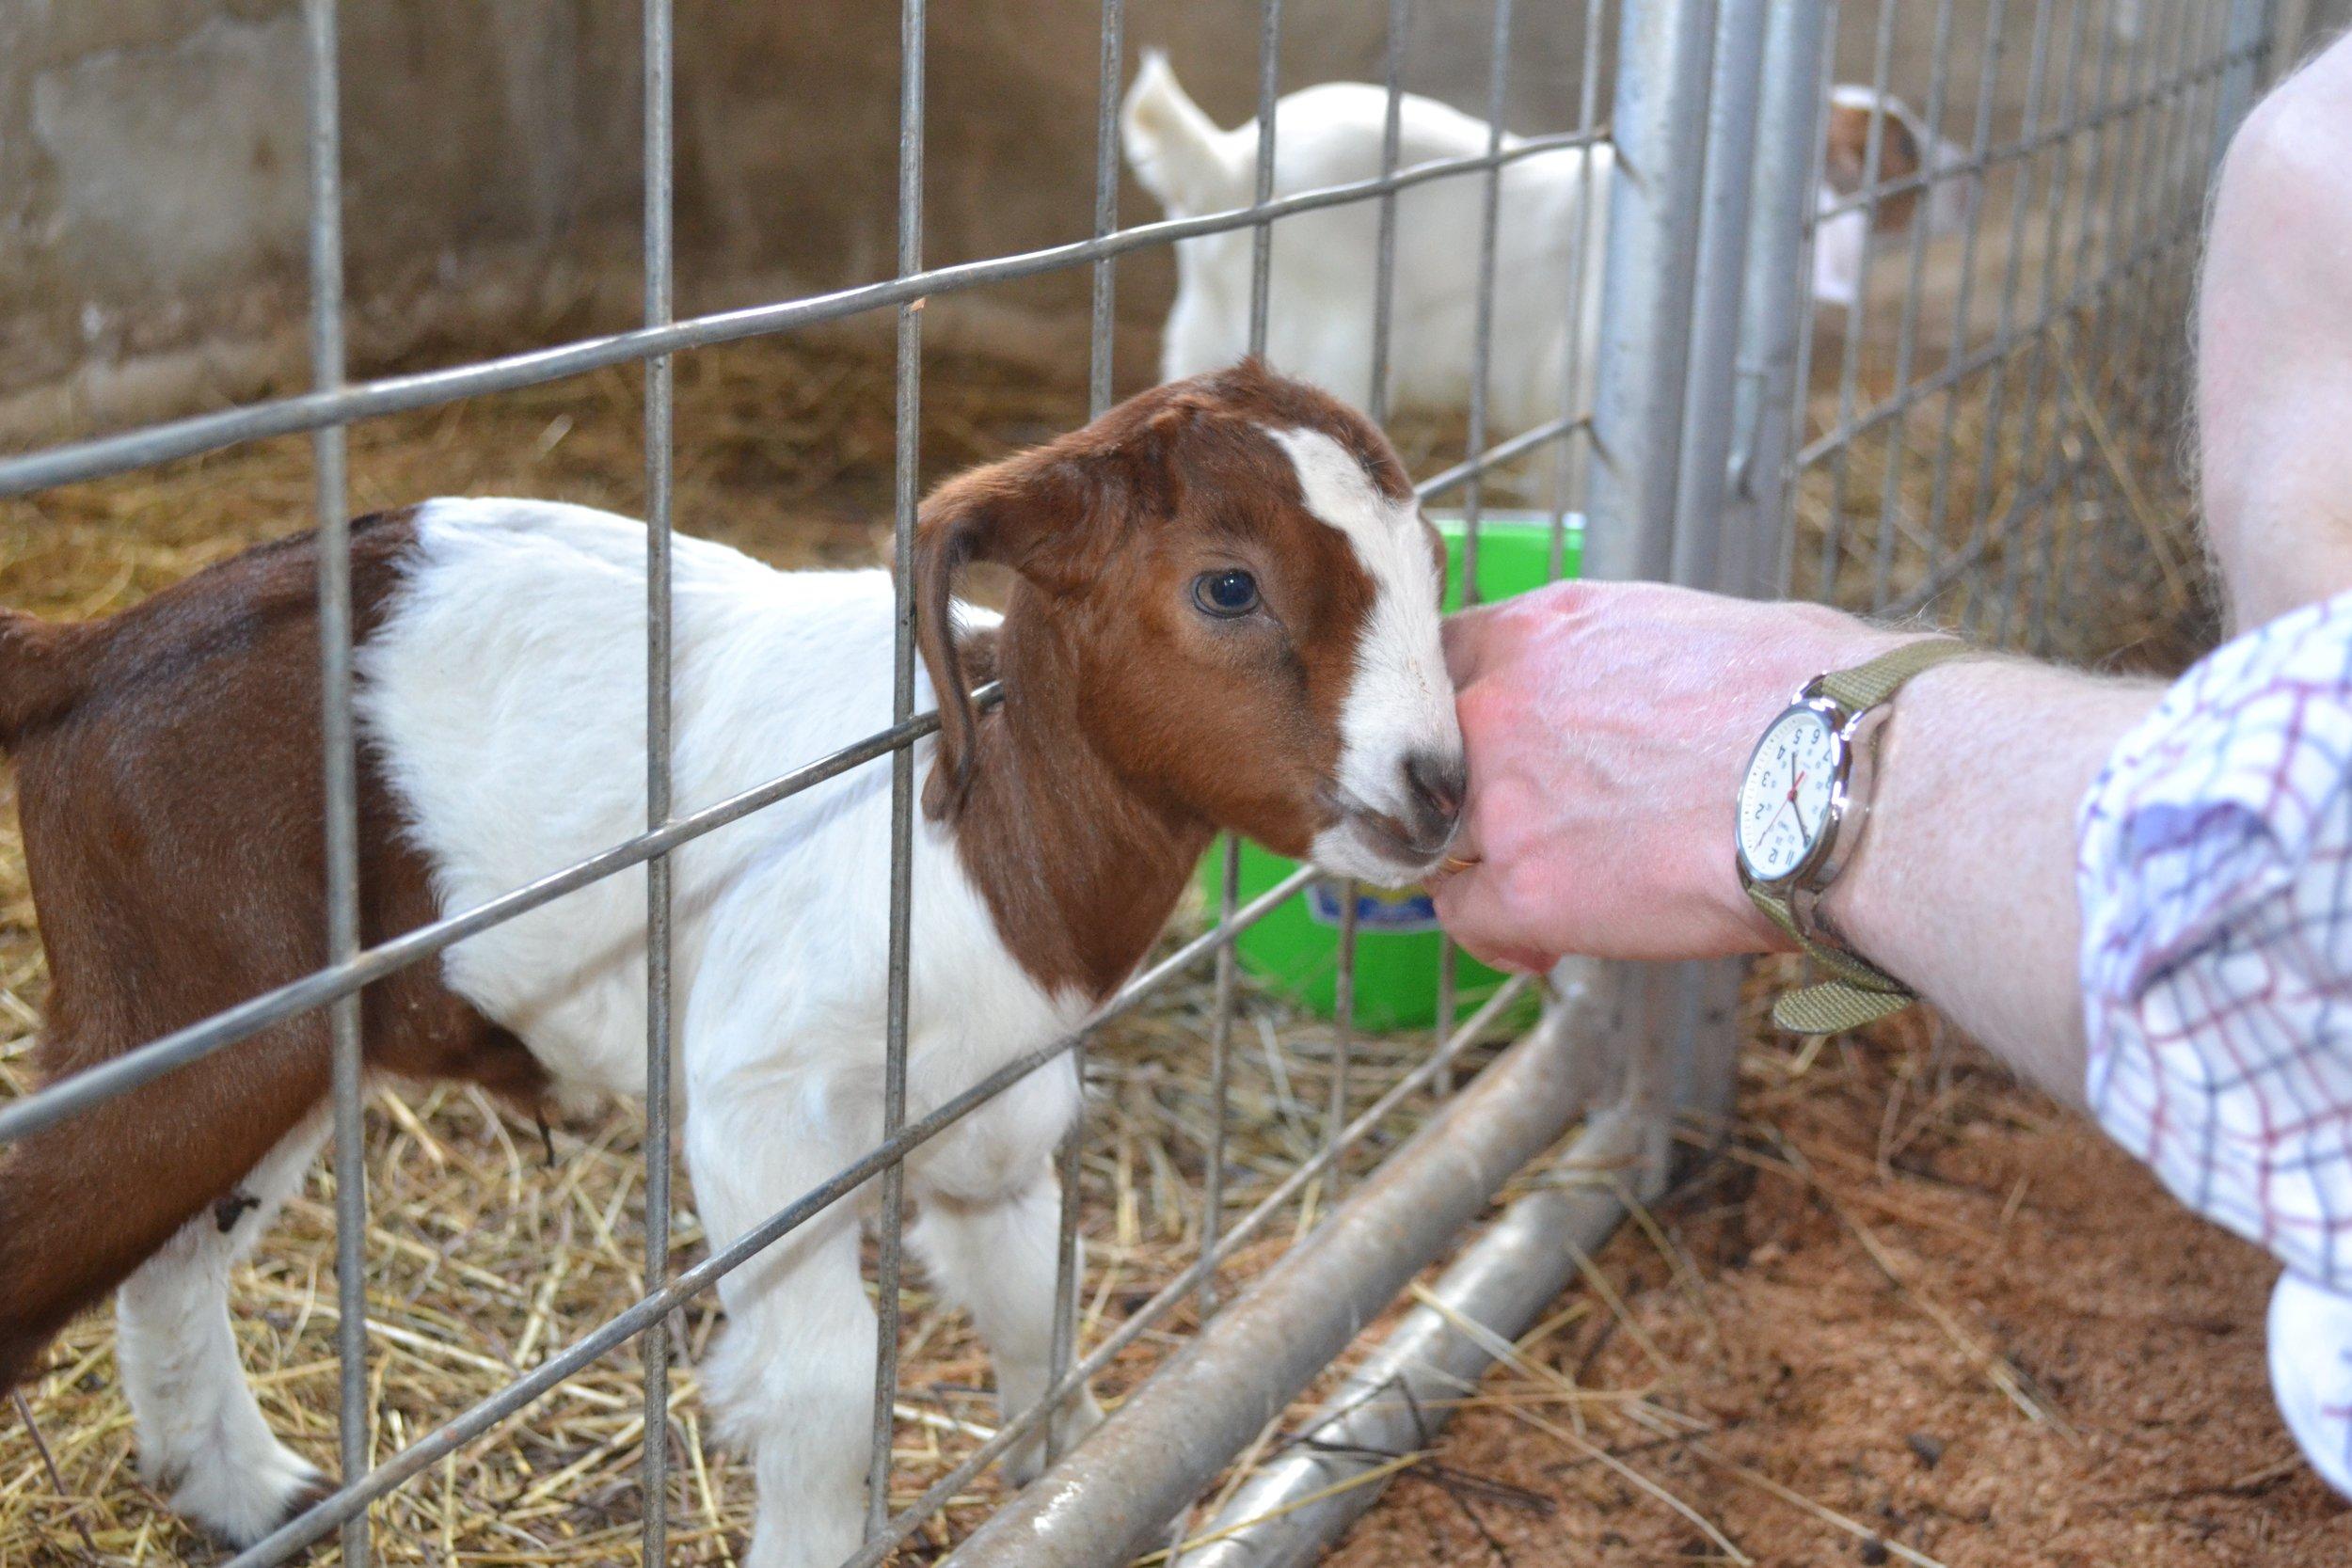 Activities_McD_Farm_Baby_Goat.jpg